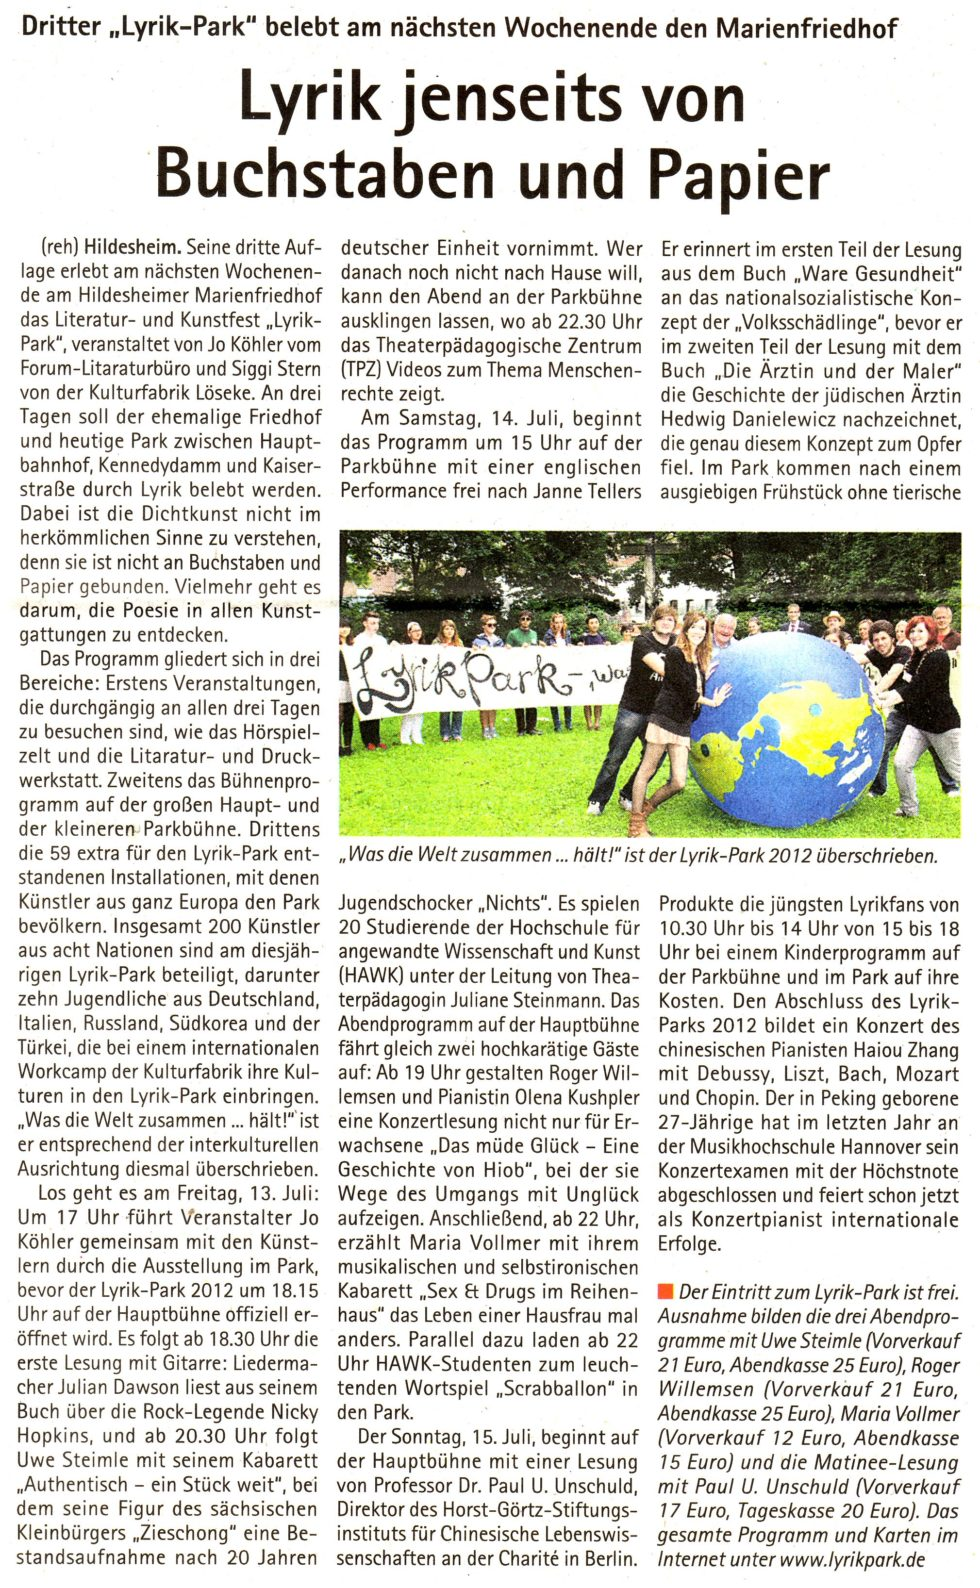 Lyrikpark2012_Presse02_ Kehrwieder 8.7.2012